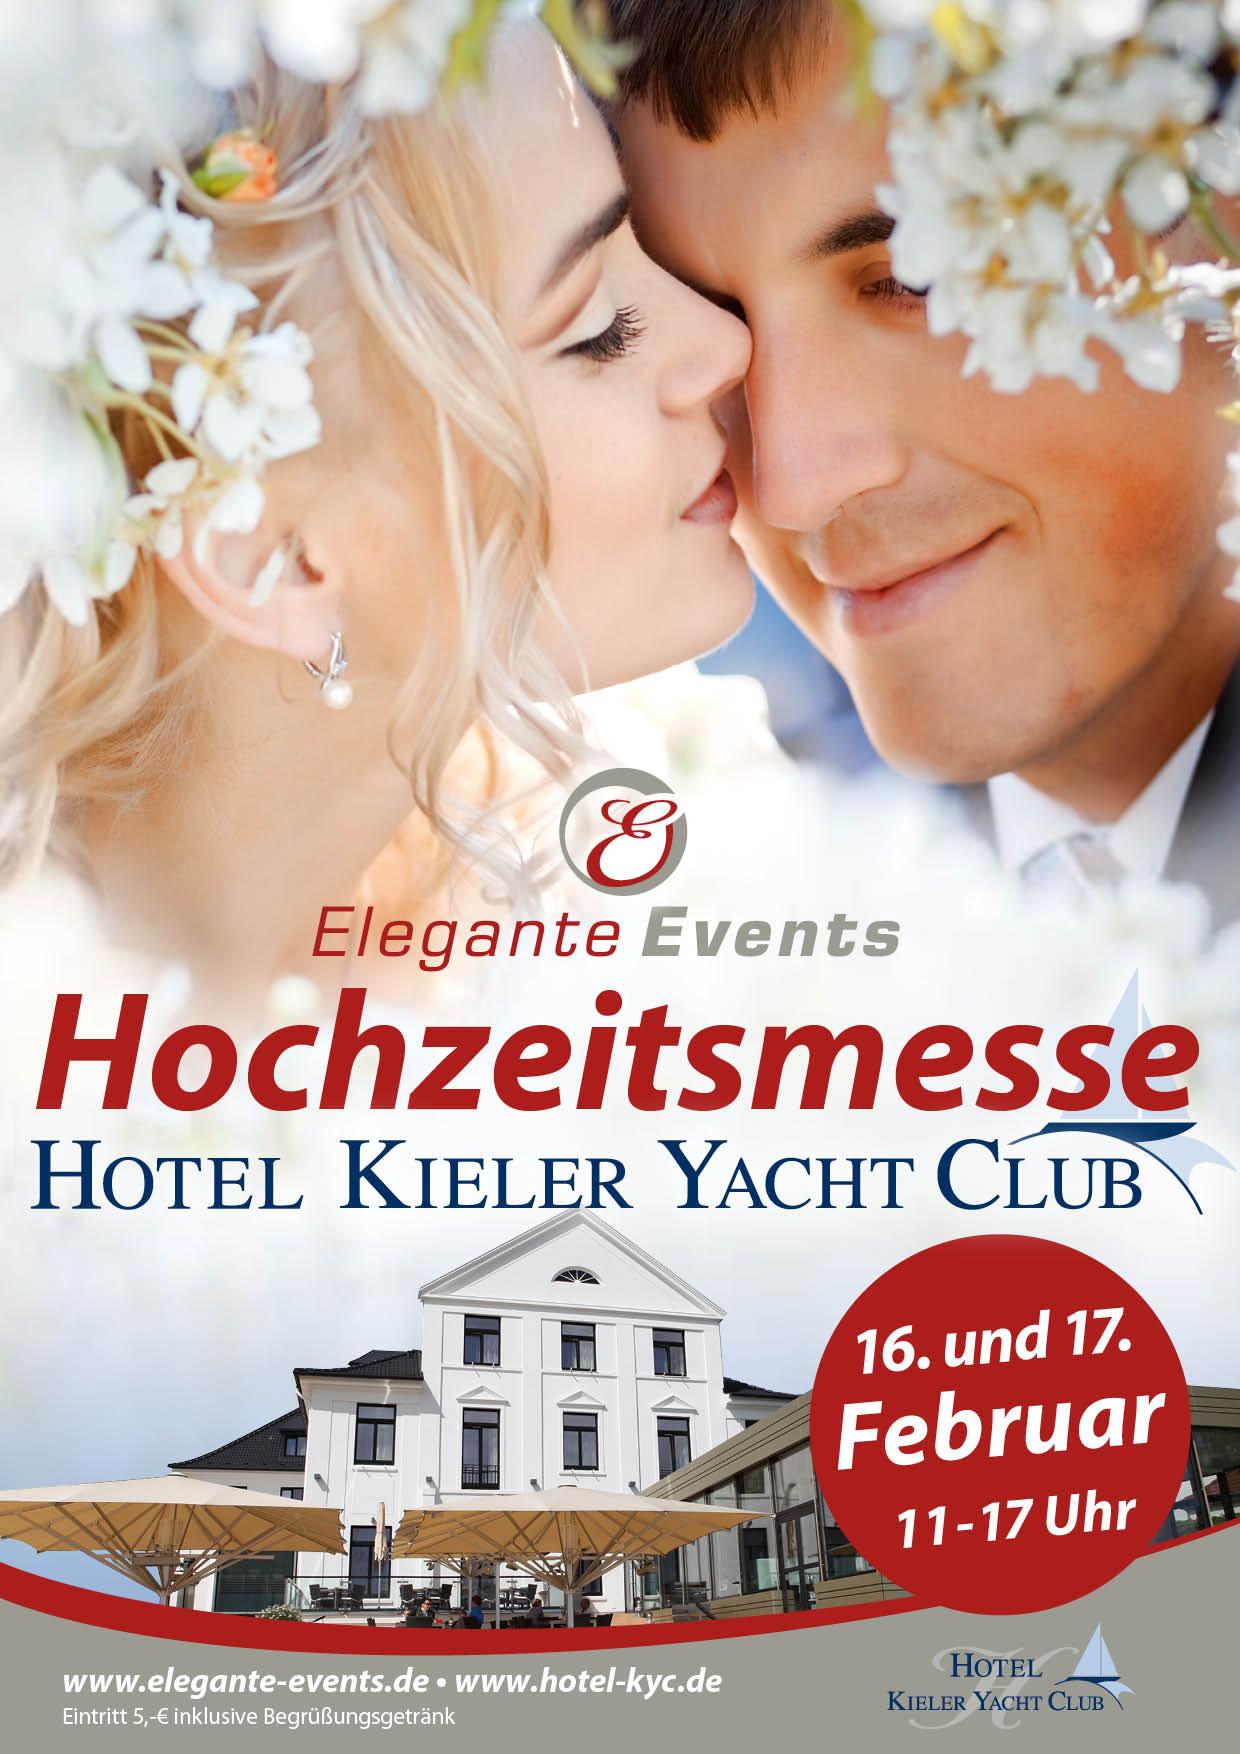 Hochzeitsmesse im Kieler Yachtclub am 16. + 17. Februar 2019.